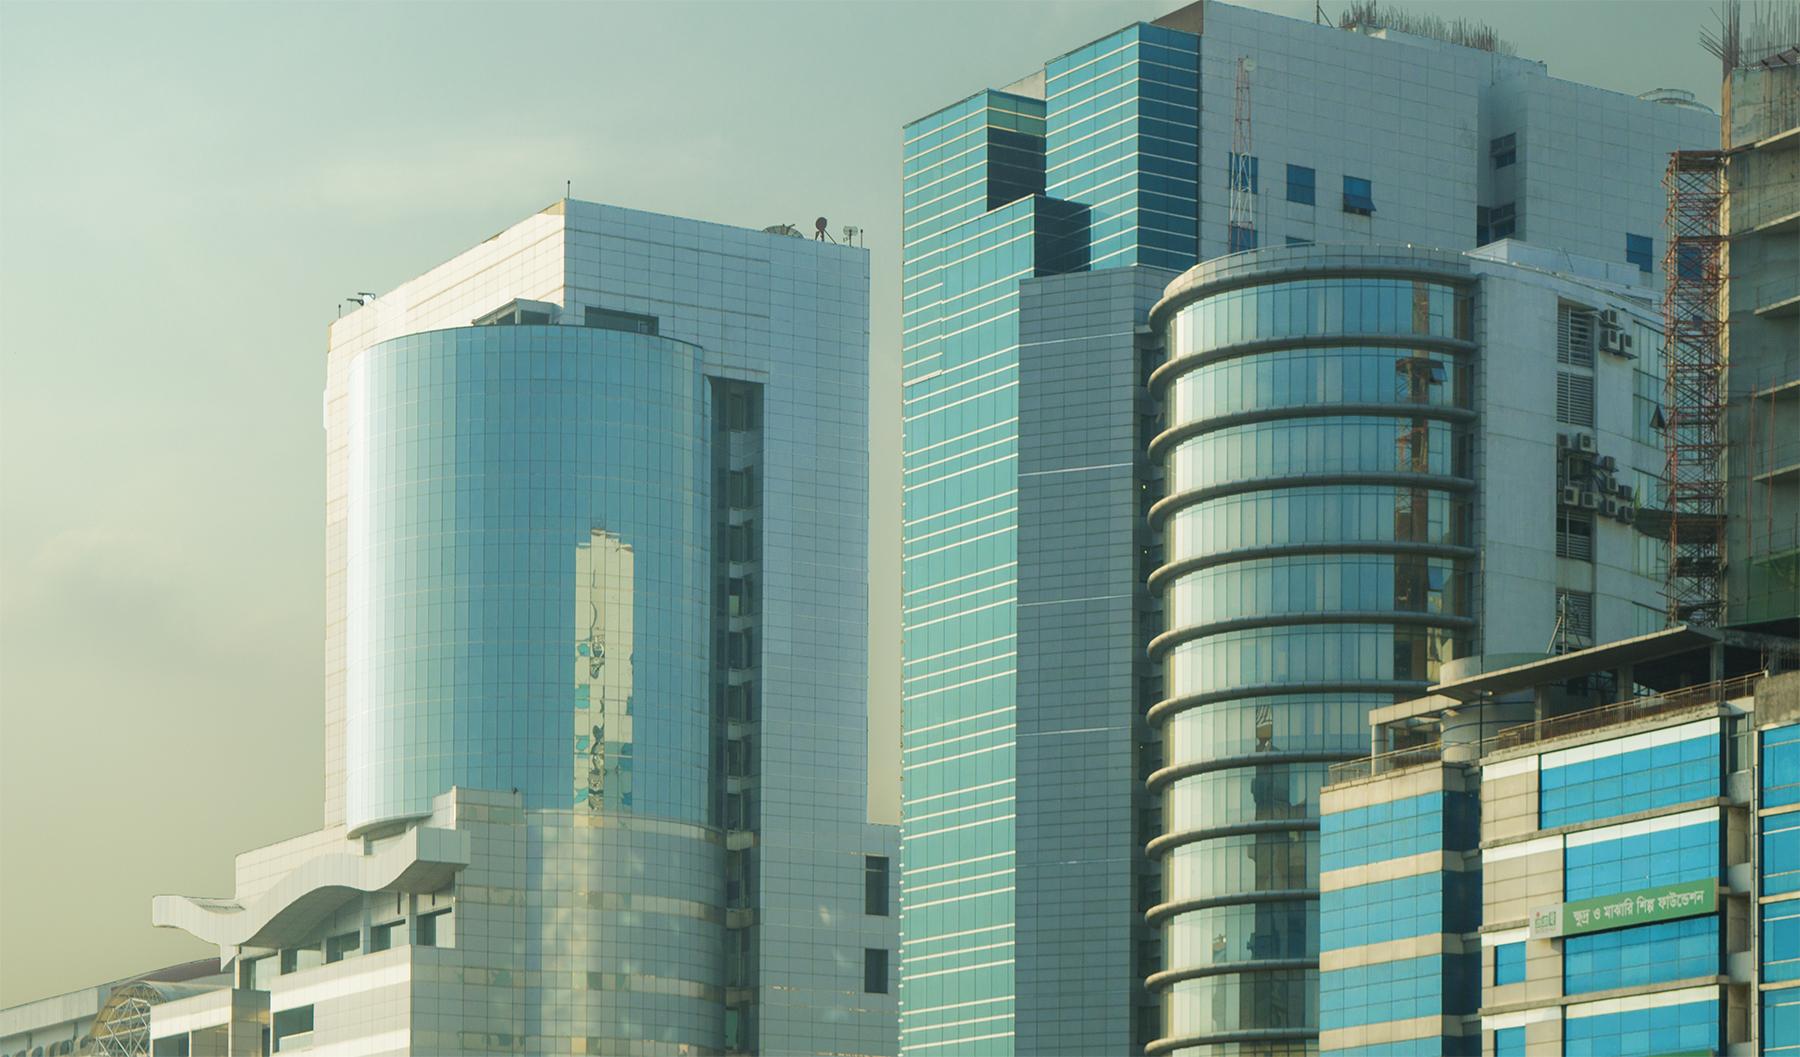 Skyscrapers in Dhaka, Bangladesh